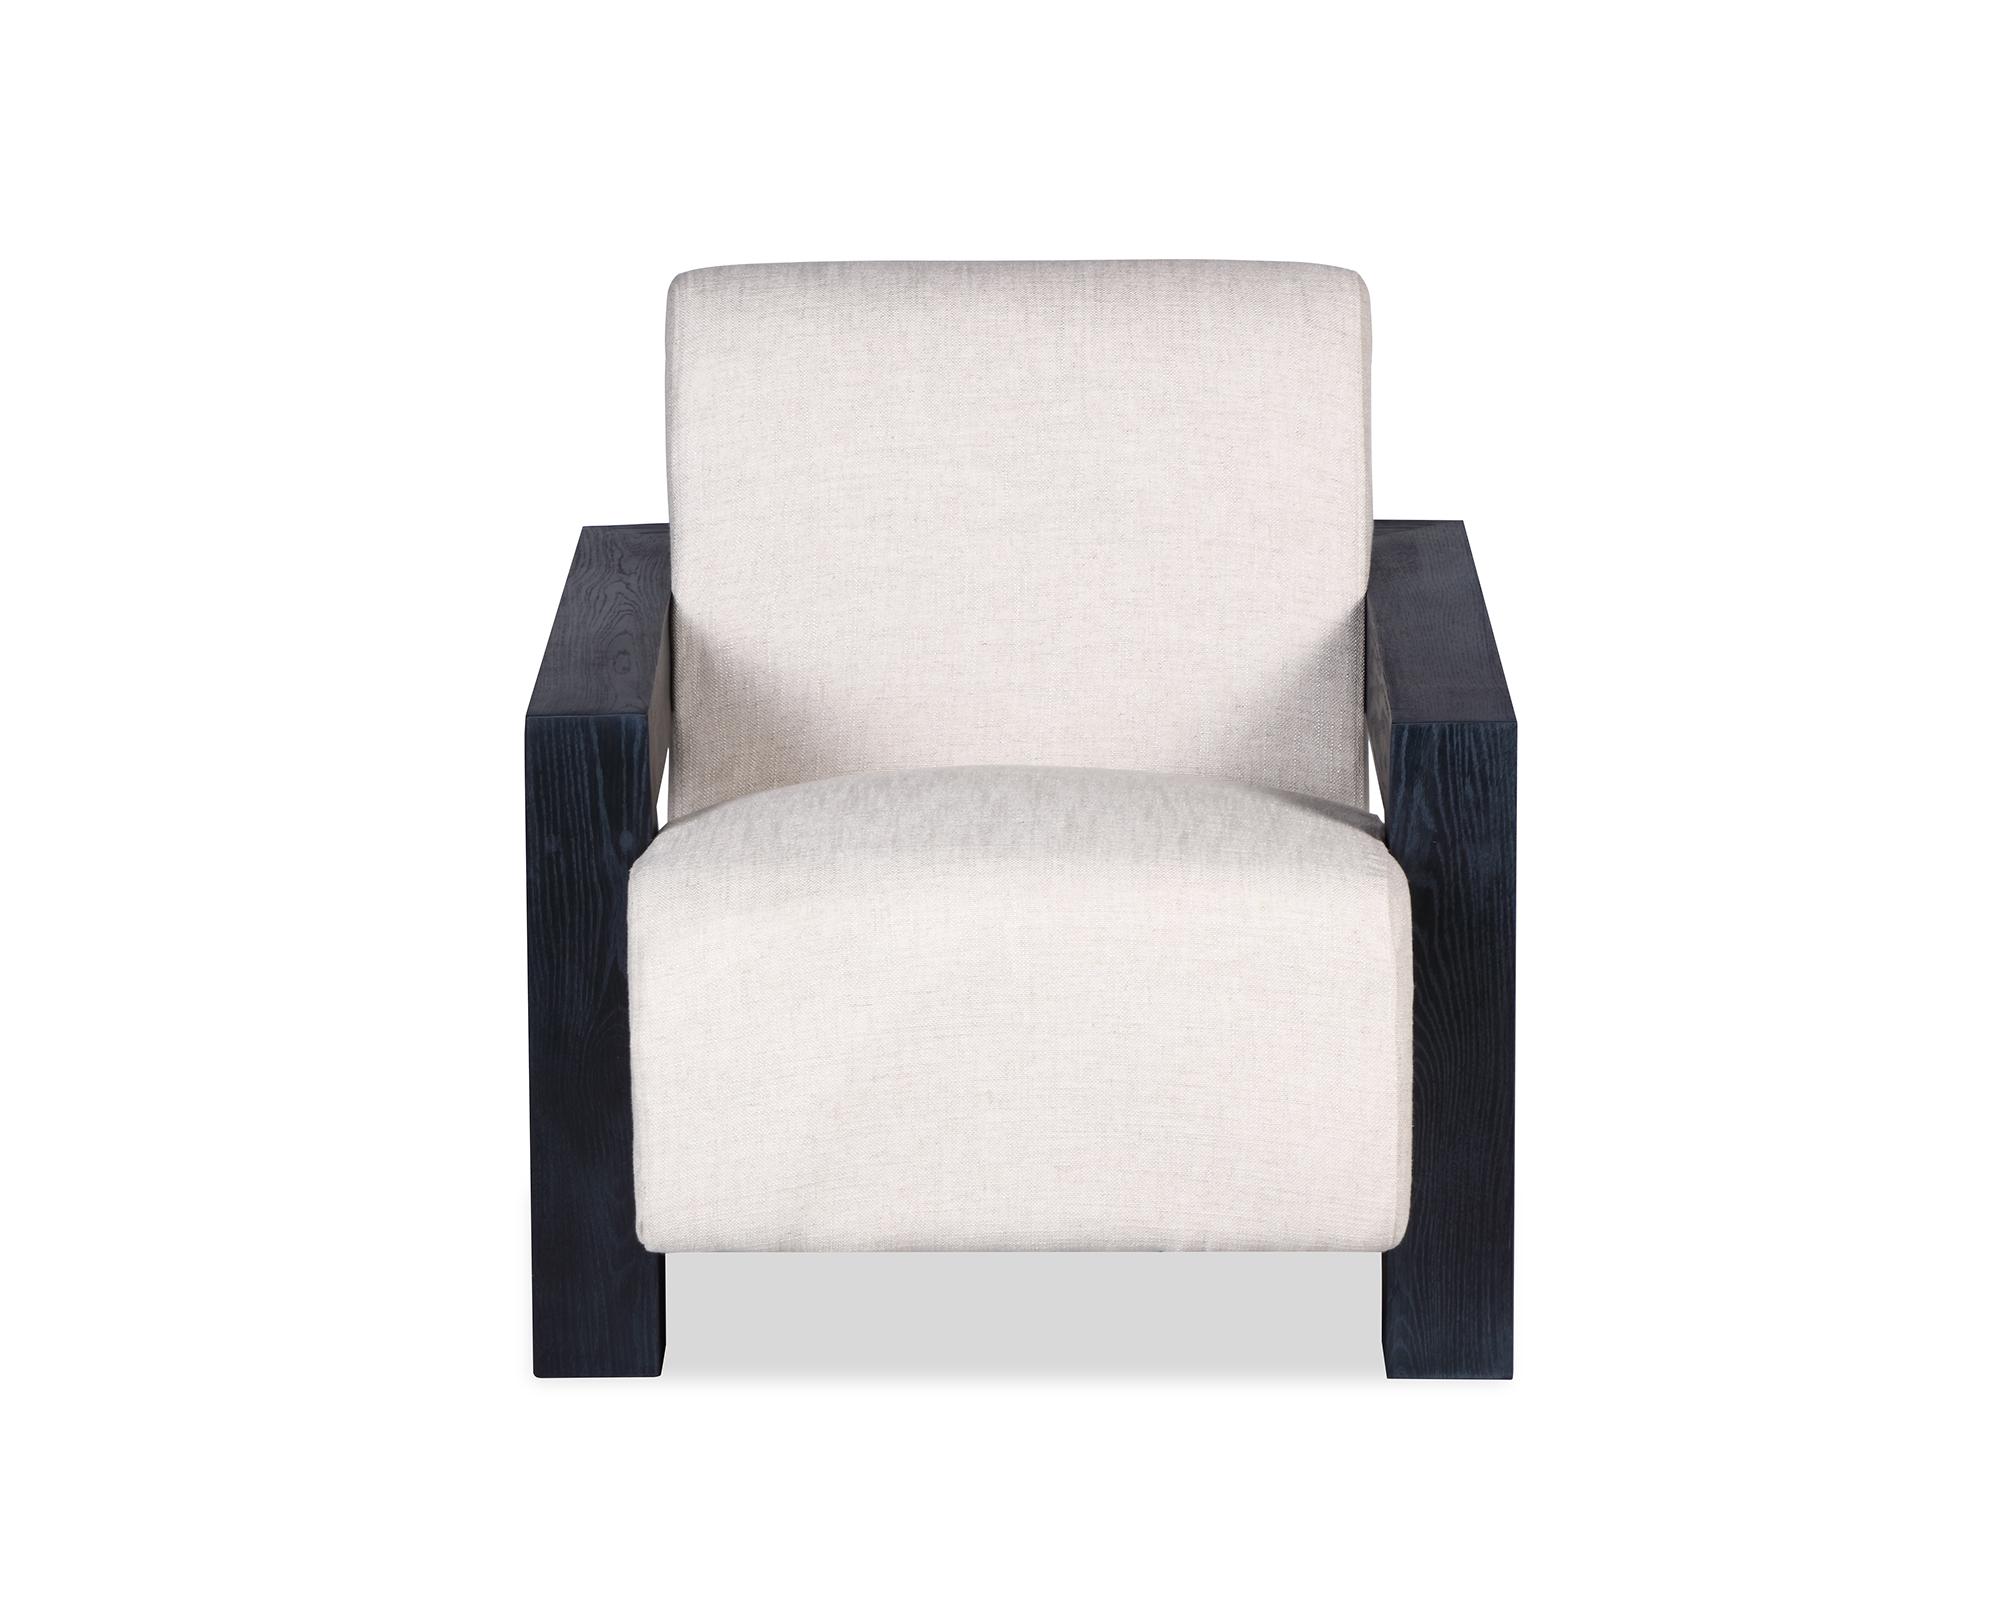 L&E Compton Occasional Chair – Sand Linen (MY-OCH-045) (5)